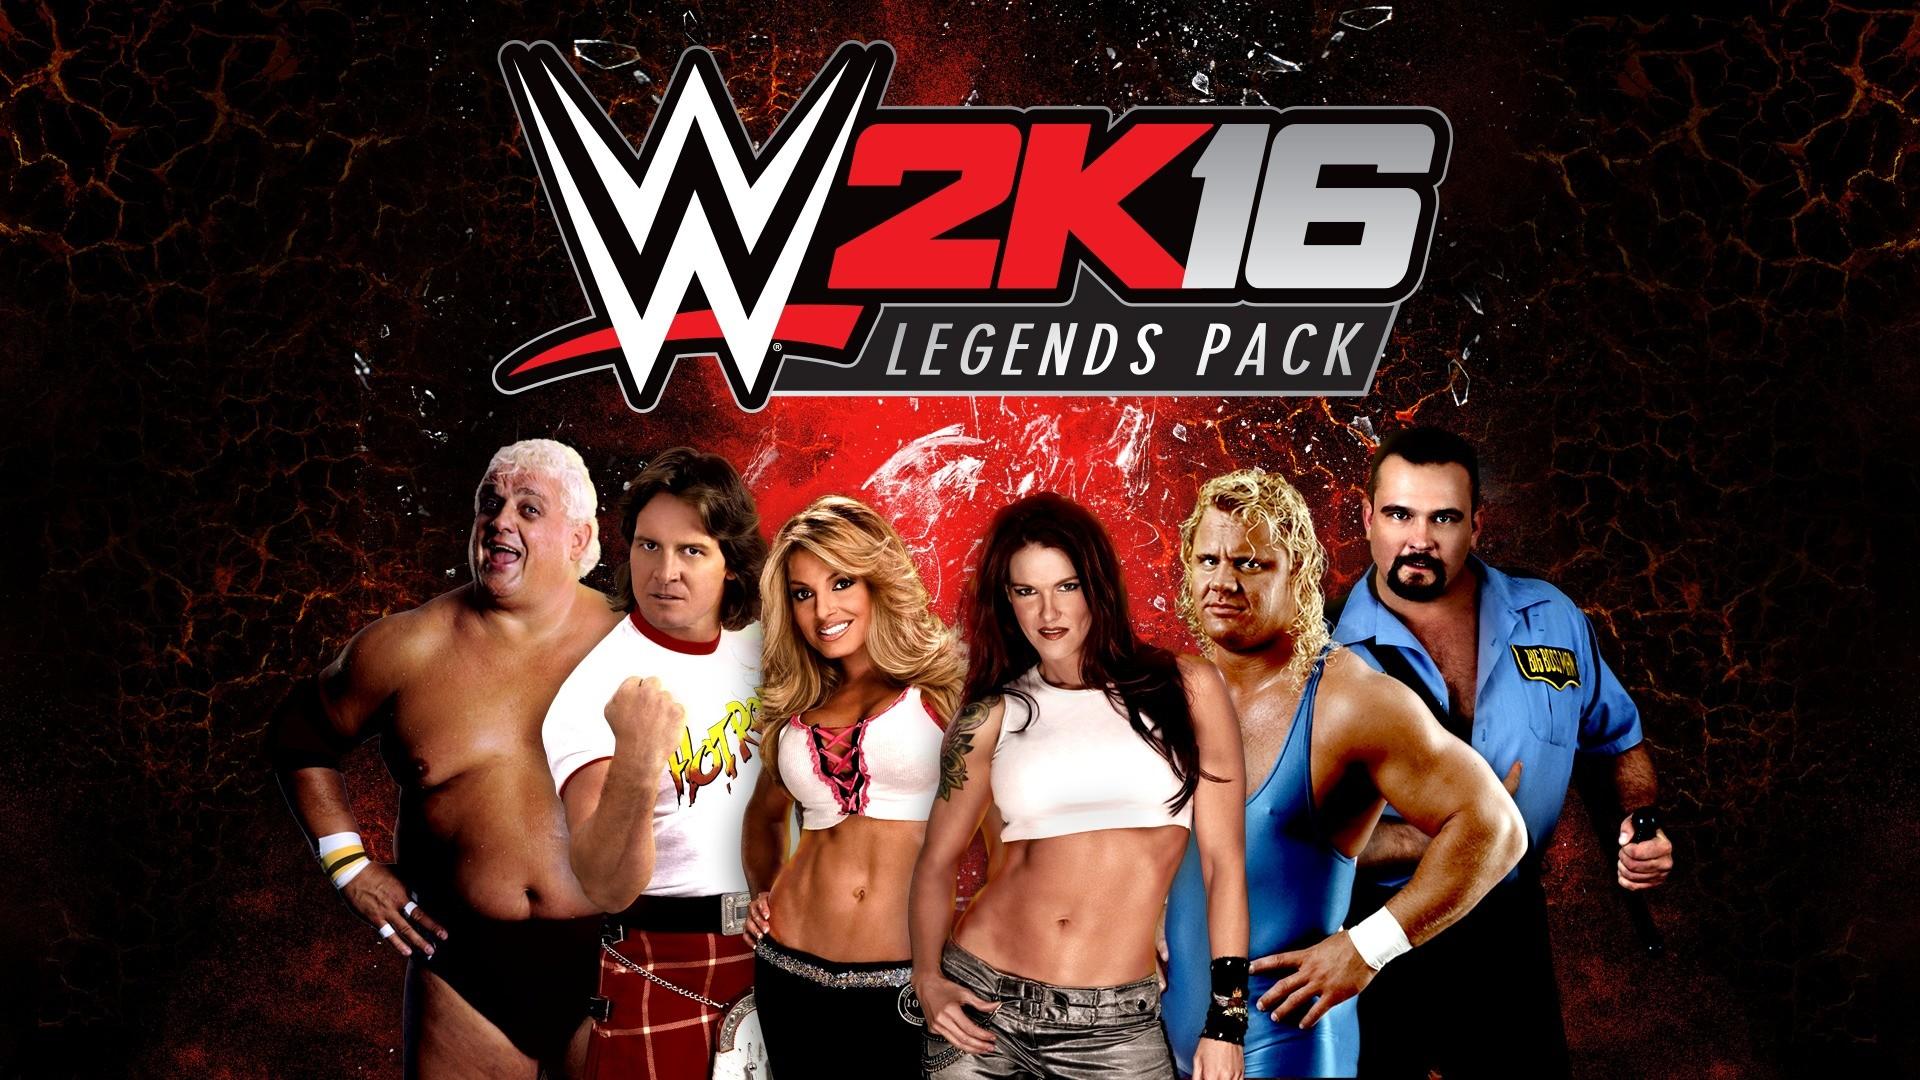 … WWE2K16 Wallpaper LegendsPack …